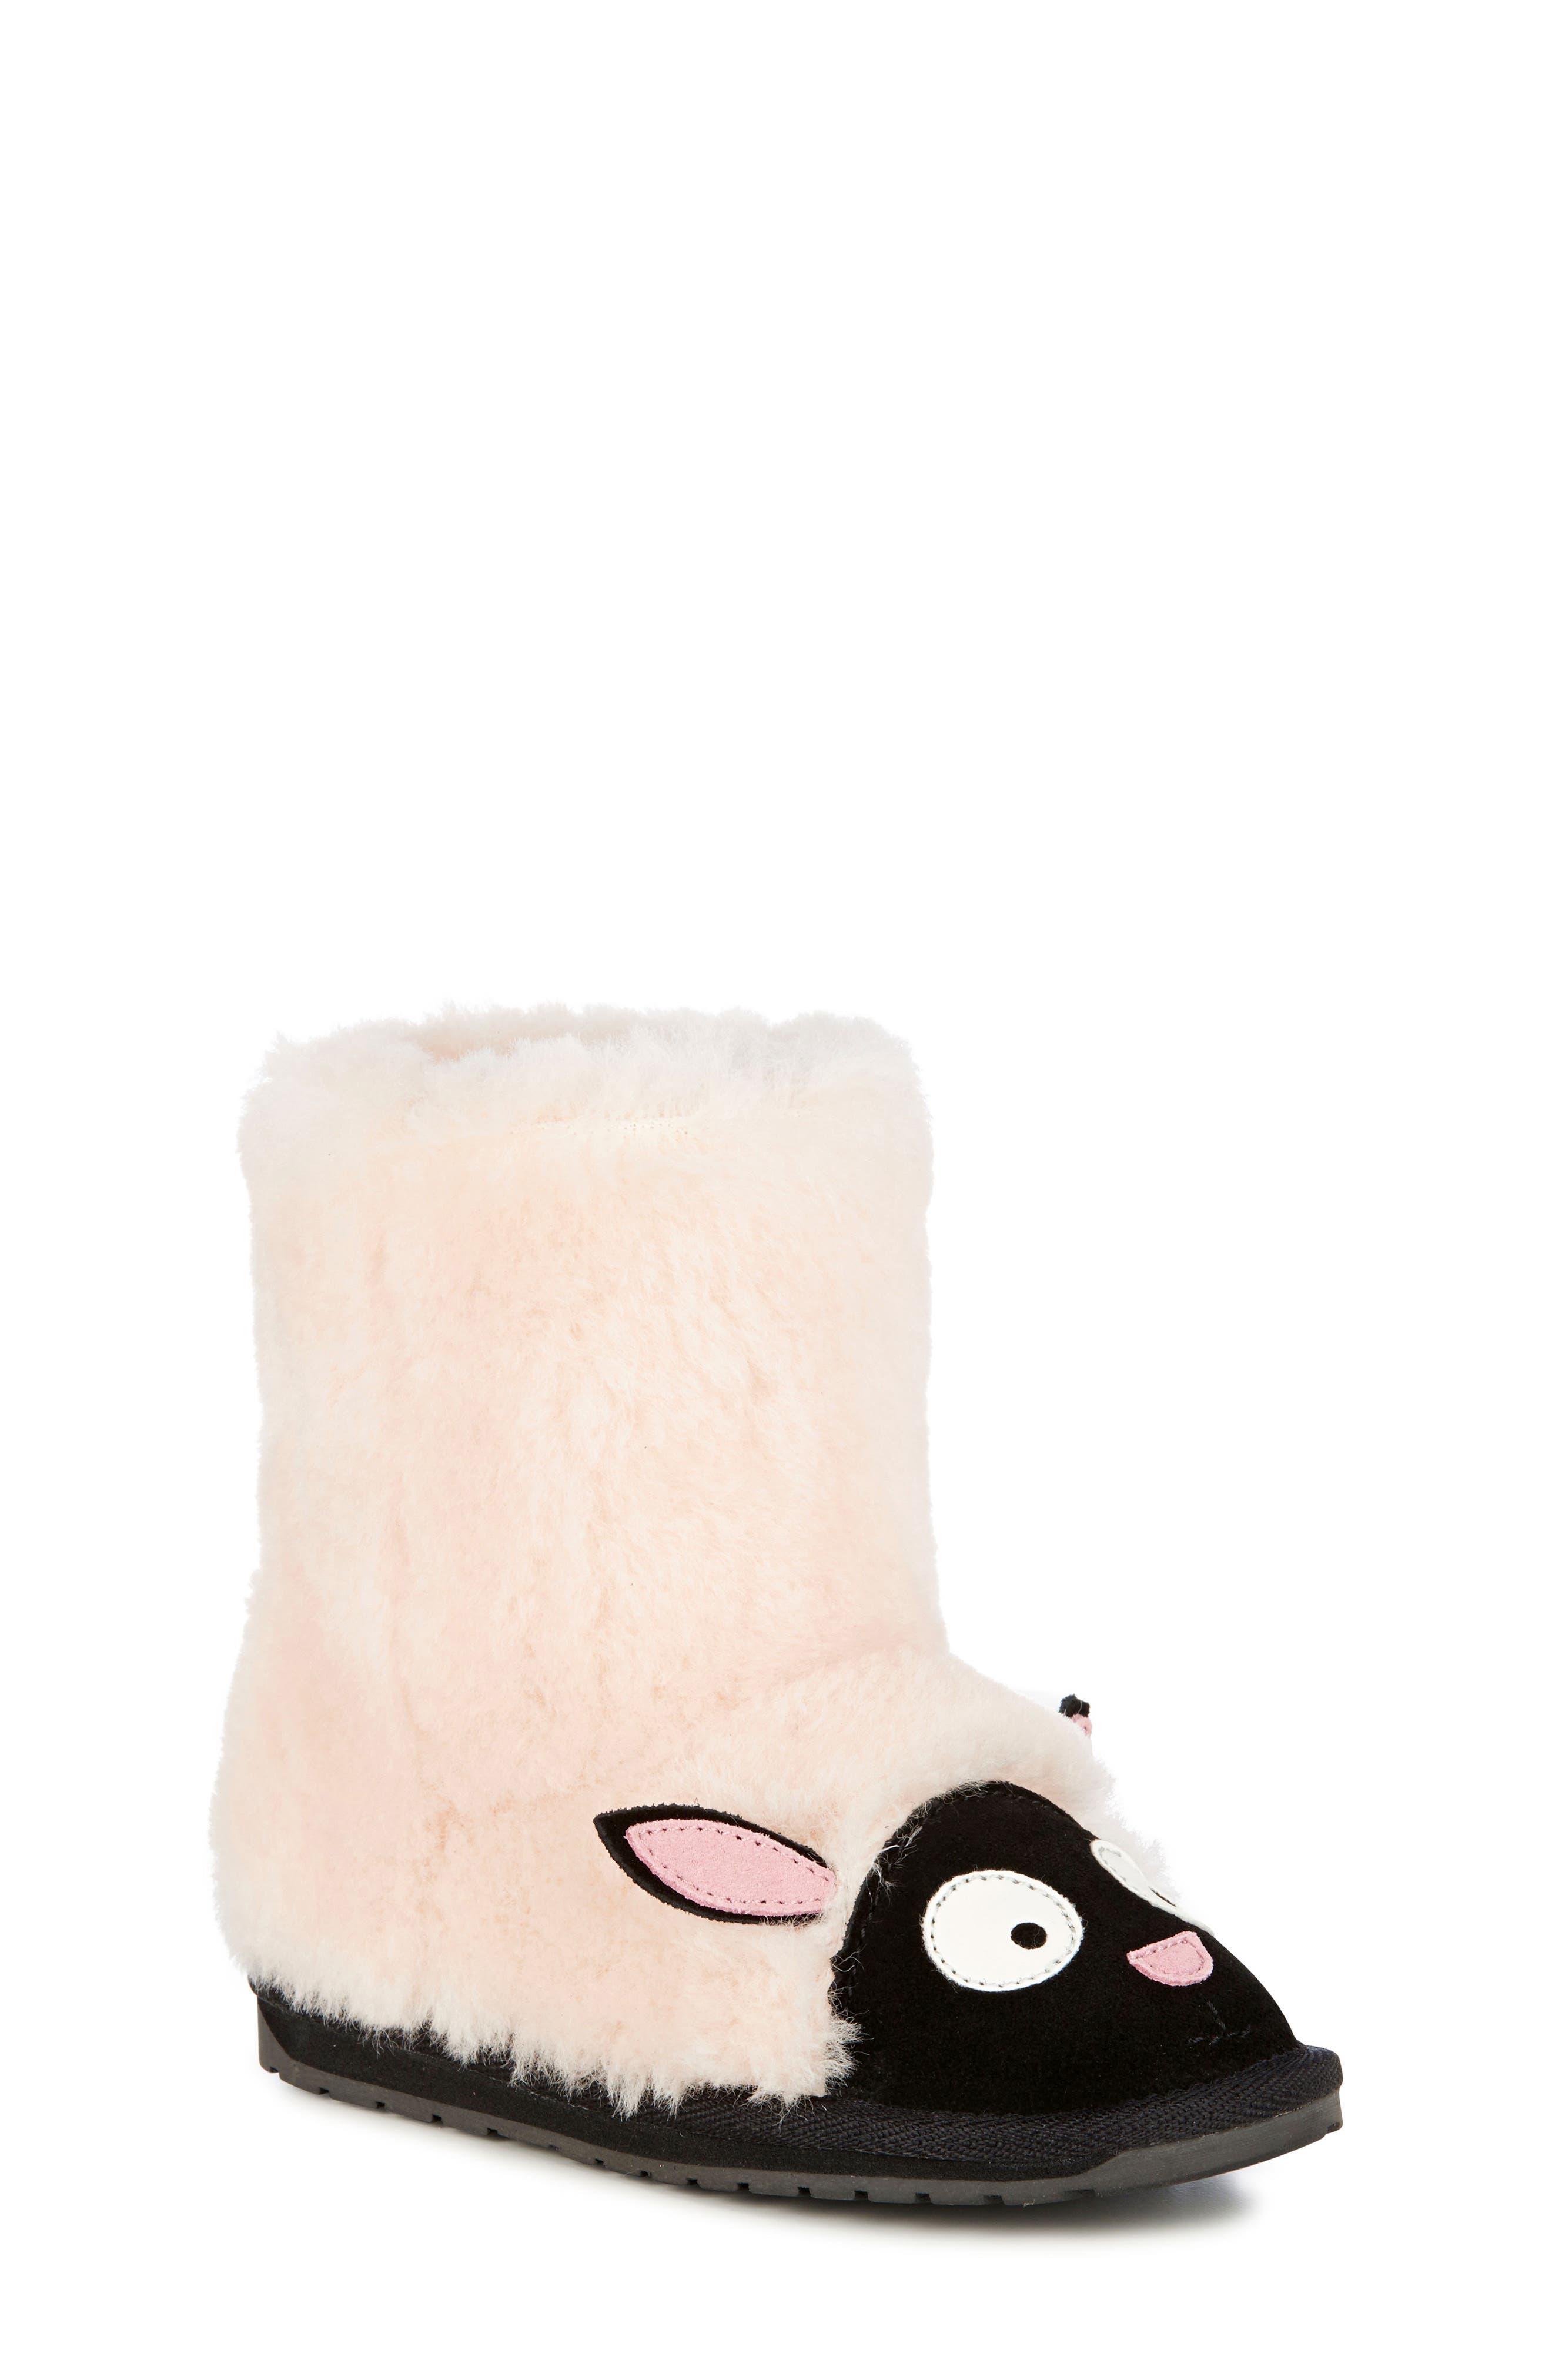 Little Creatures - Lamb Boot,                             Main thumbnail 1, color,                             NATURAL